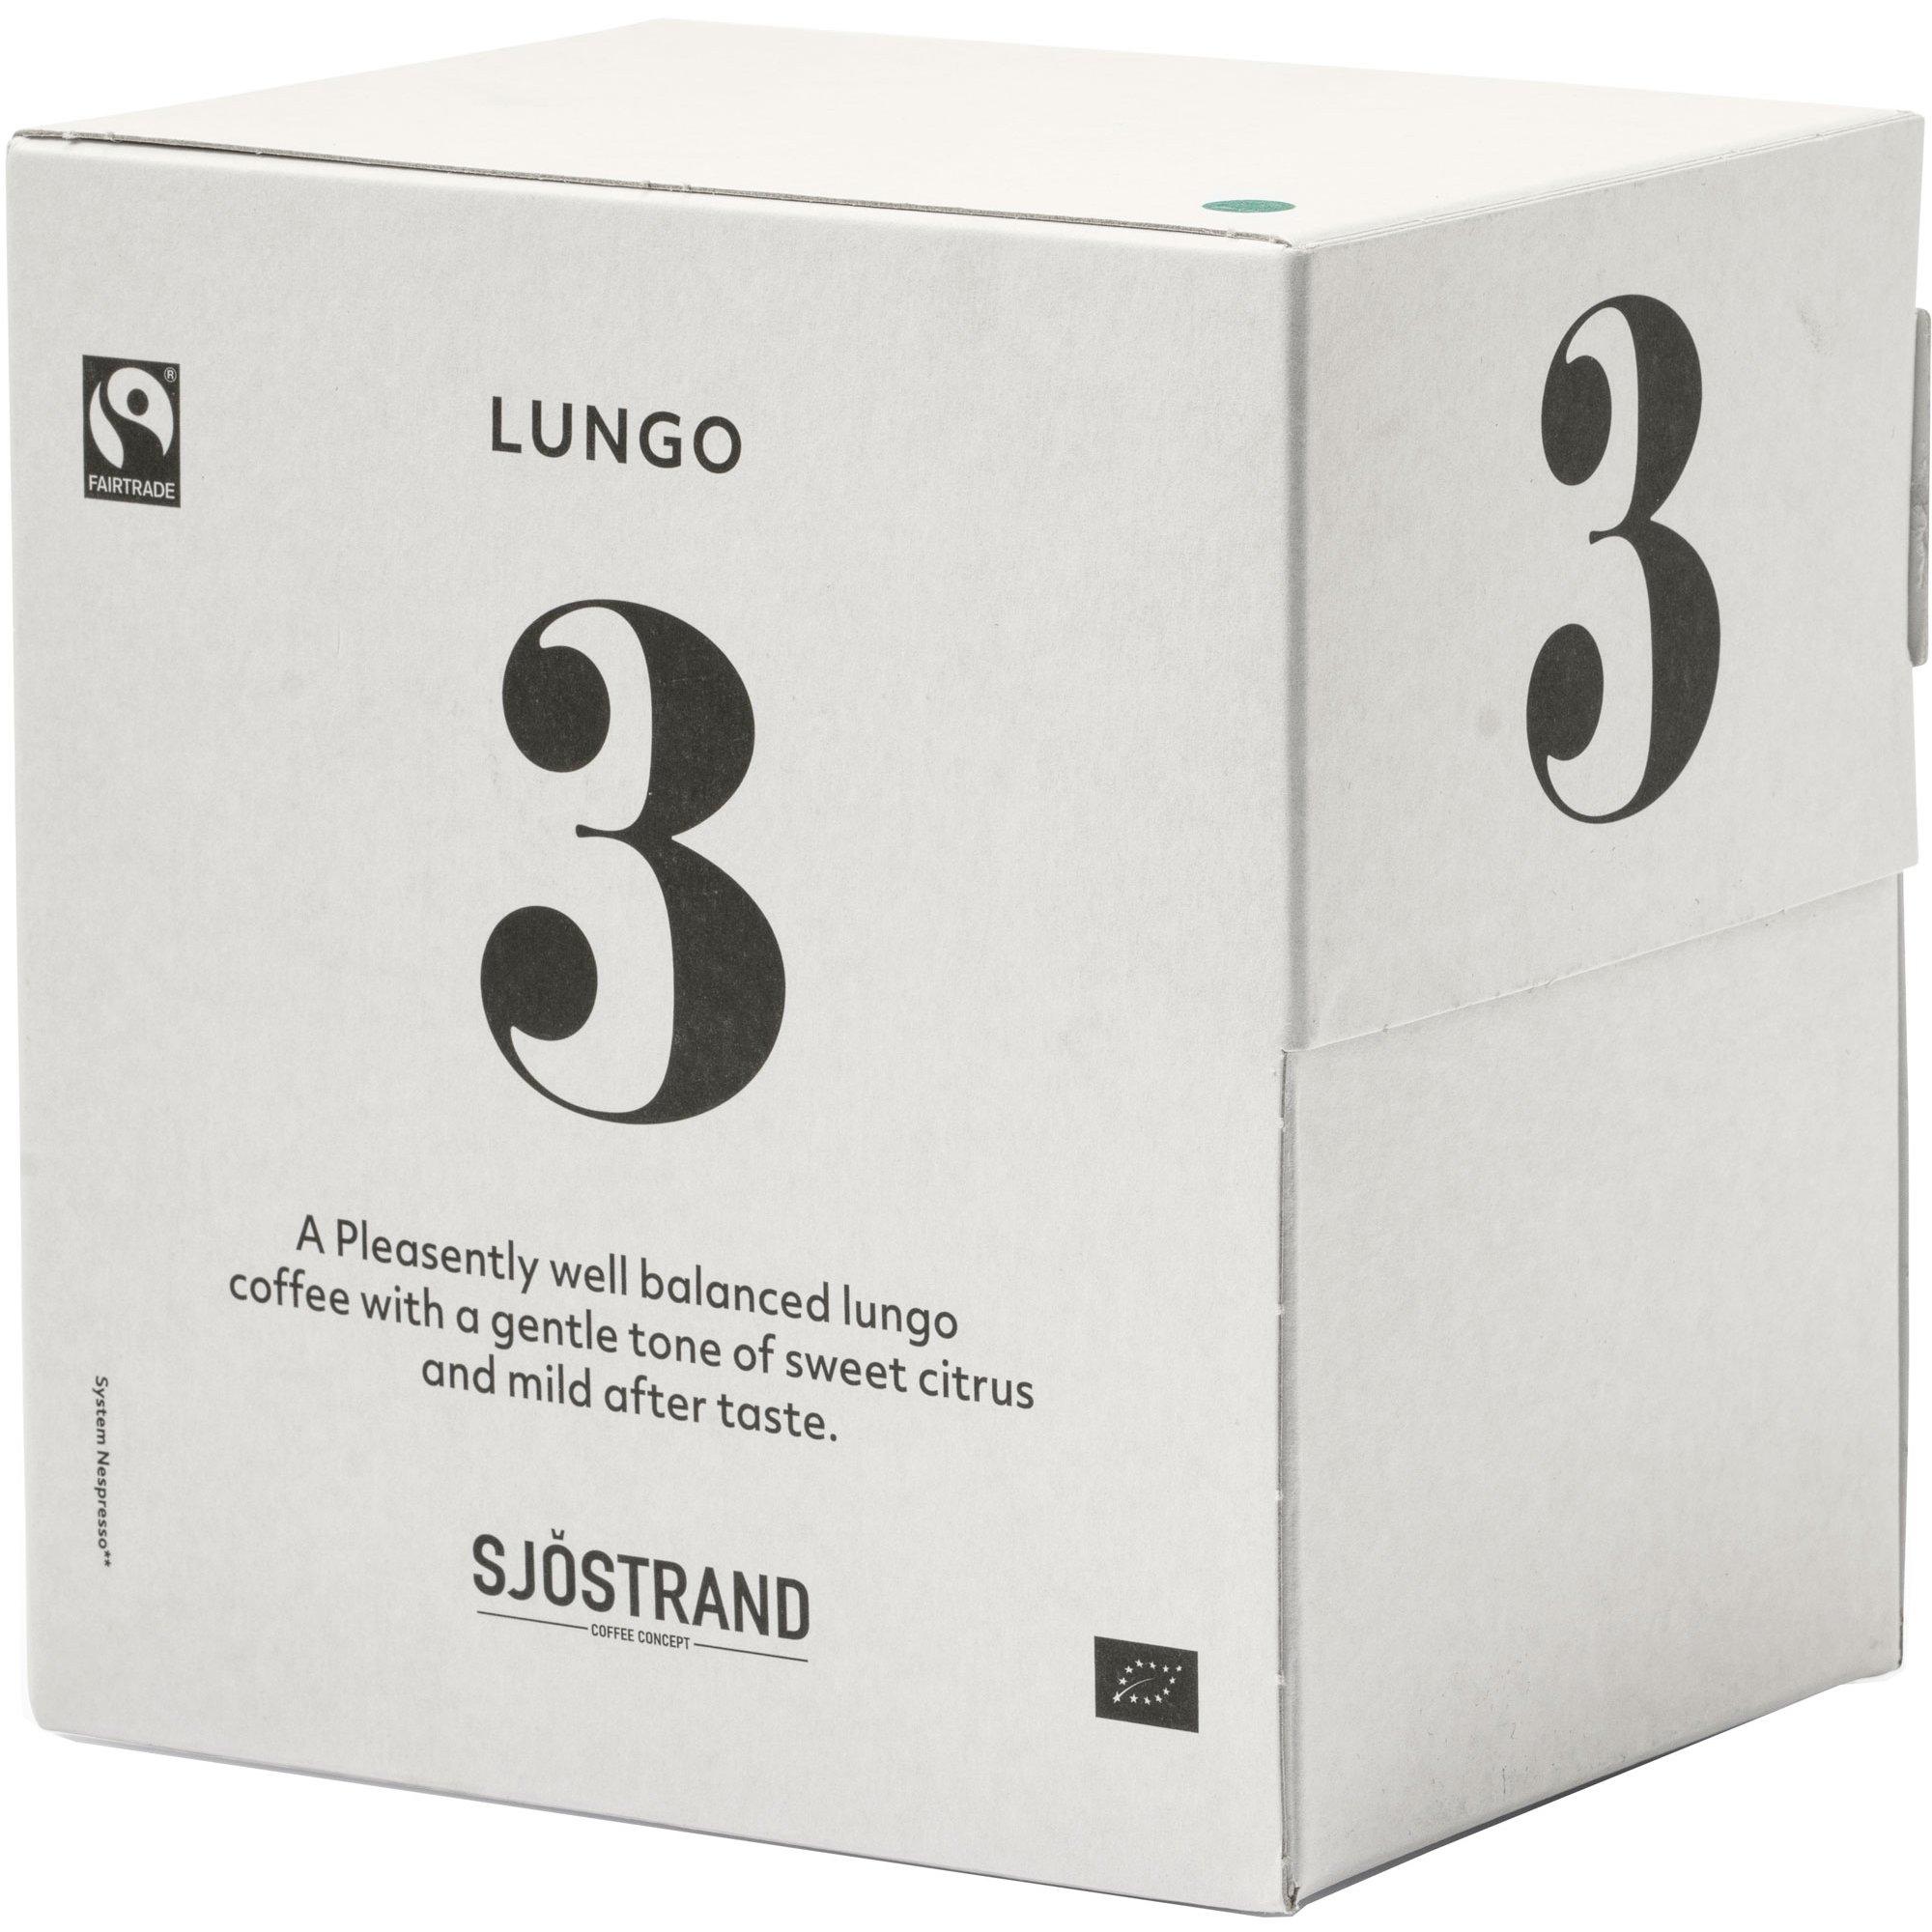 Sjöstrand Sjöstrand N°3 Lungo Kapslar, 100-pack